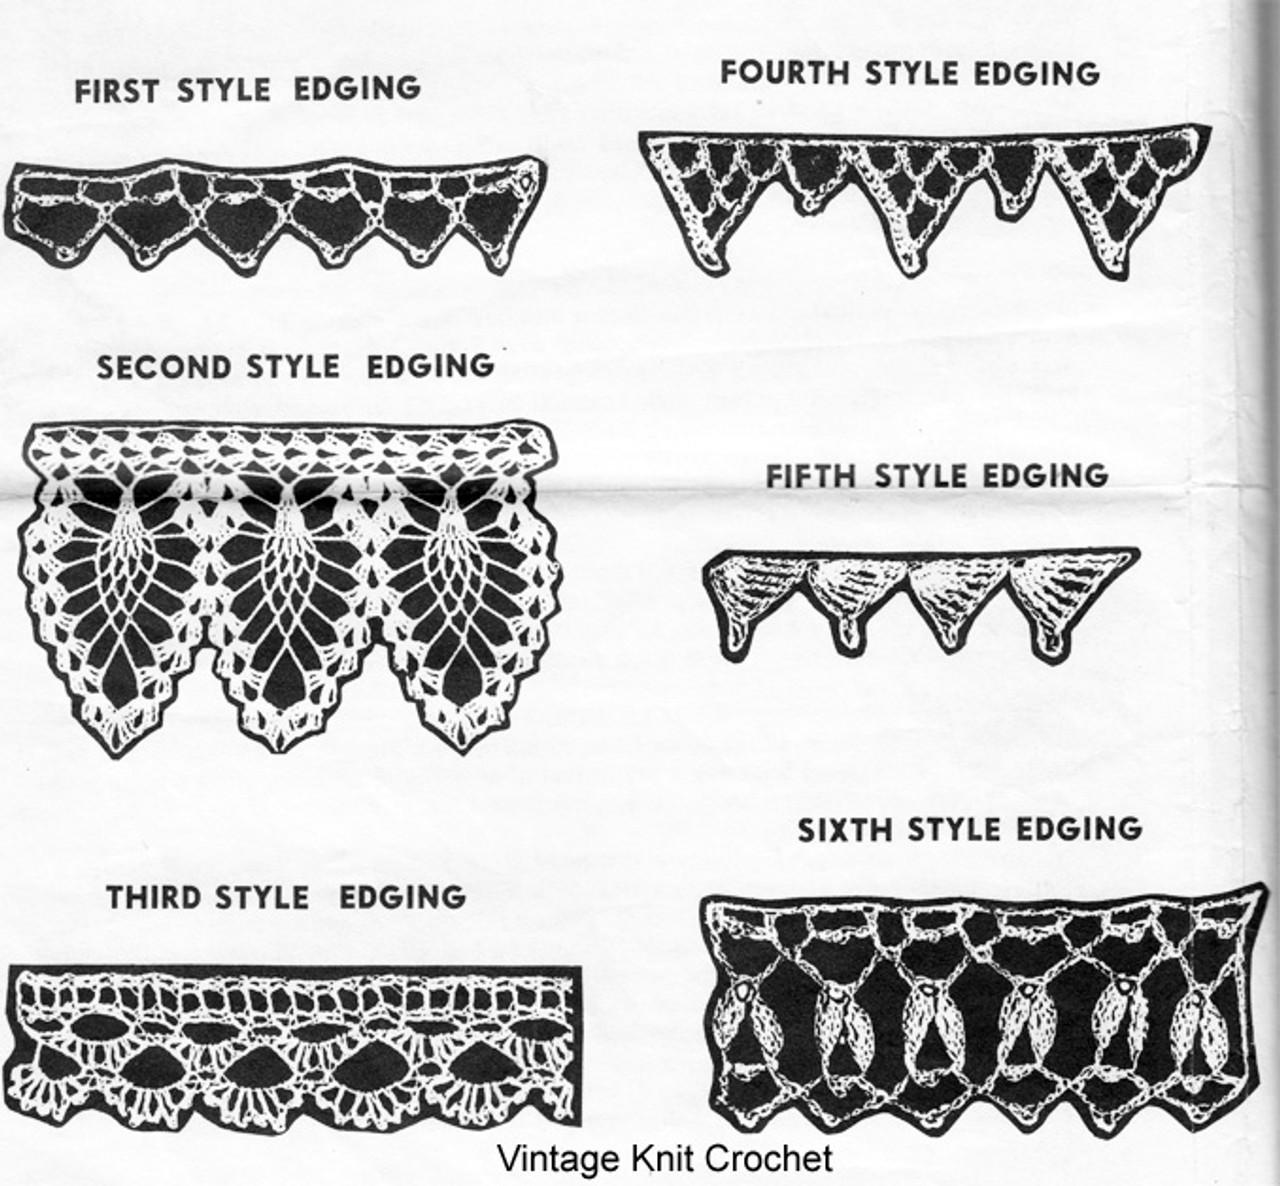 Crochet pineapple edging pattern, Alice Brooks 7101